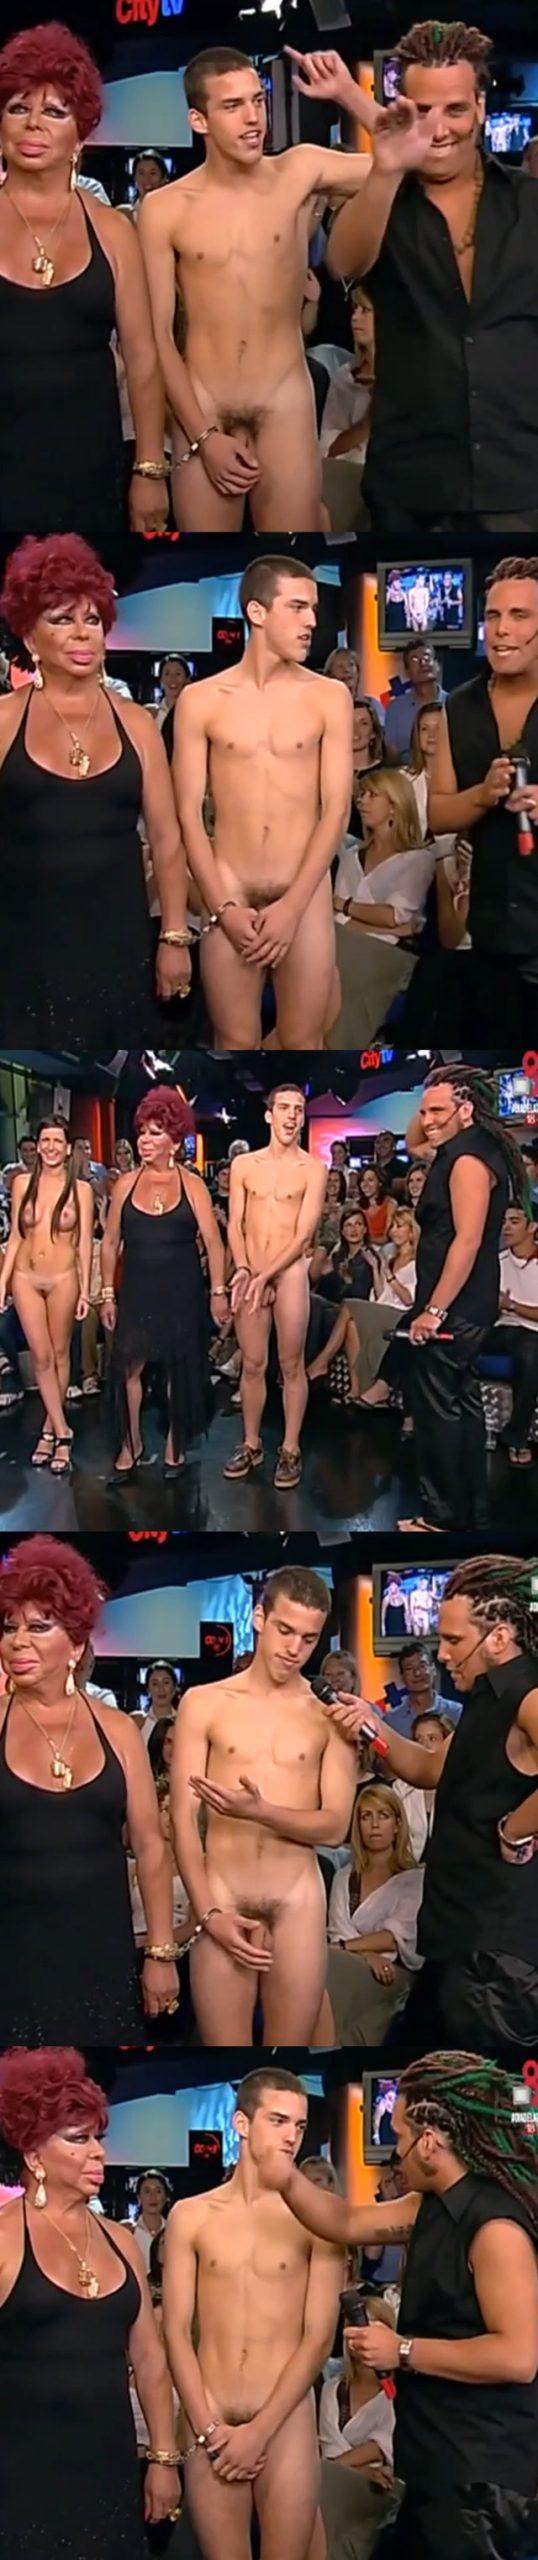 straight guy full frontal naked on tv show